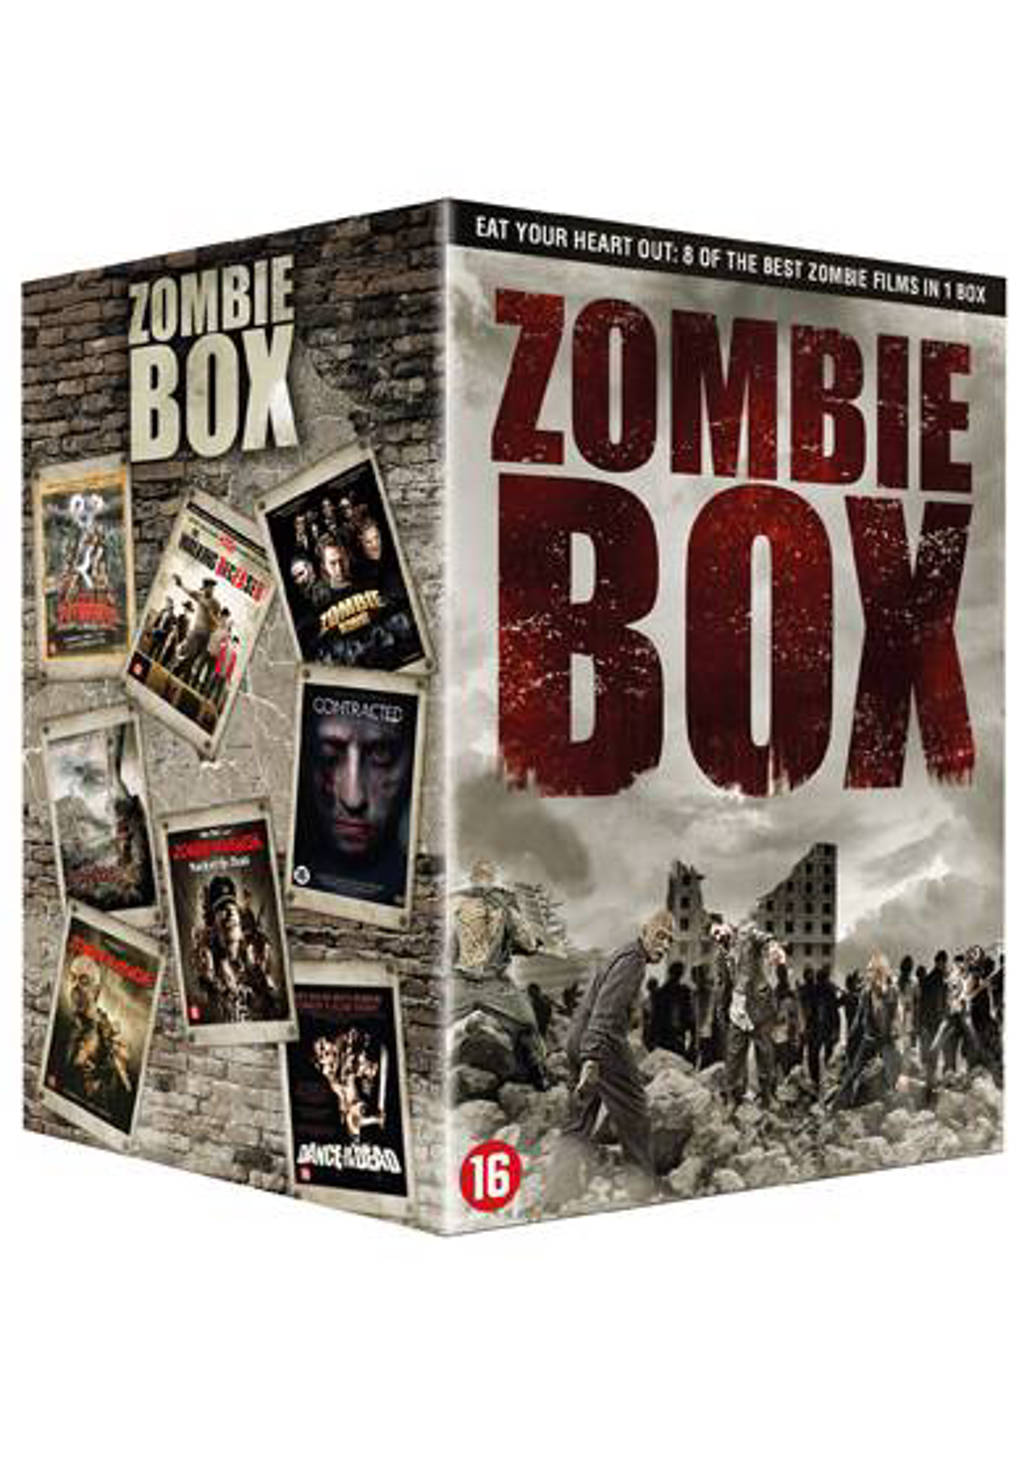 Zombie box (DVD)